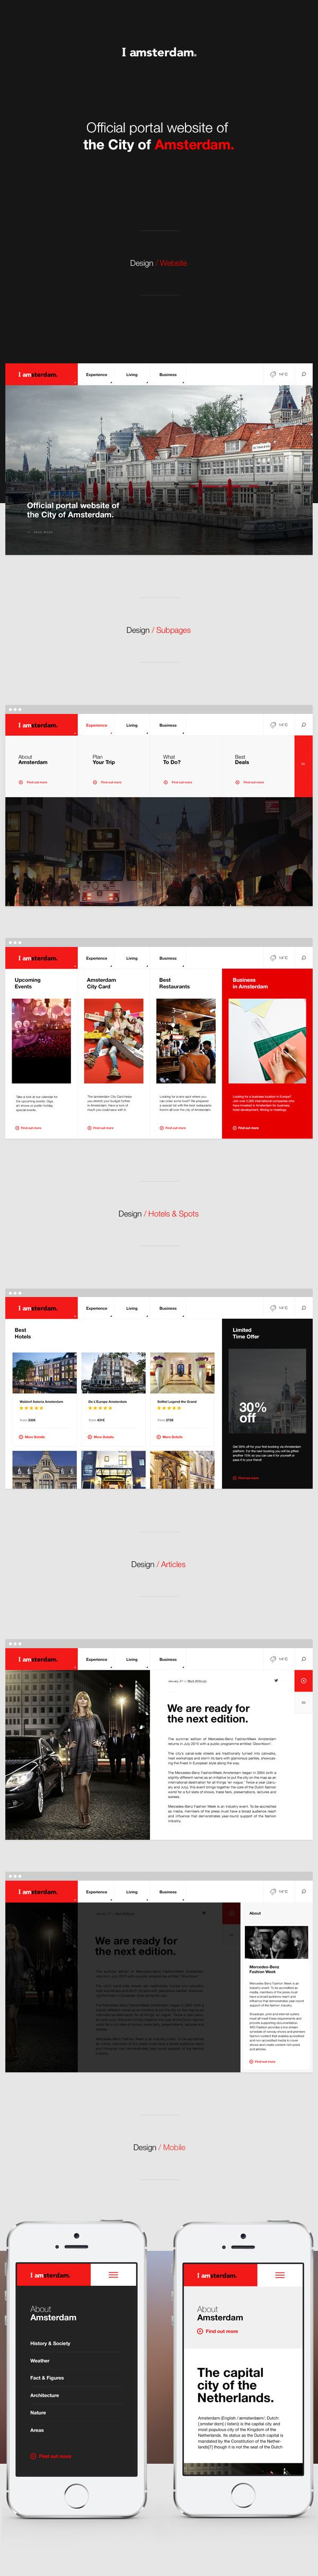 IAmsterdam UI | Abduzeedo Design Inspiration